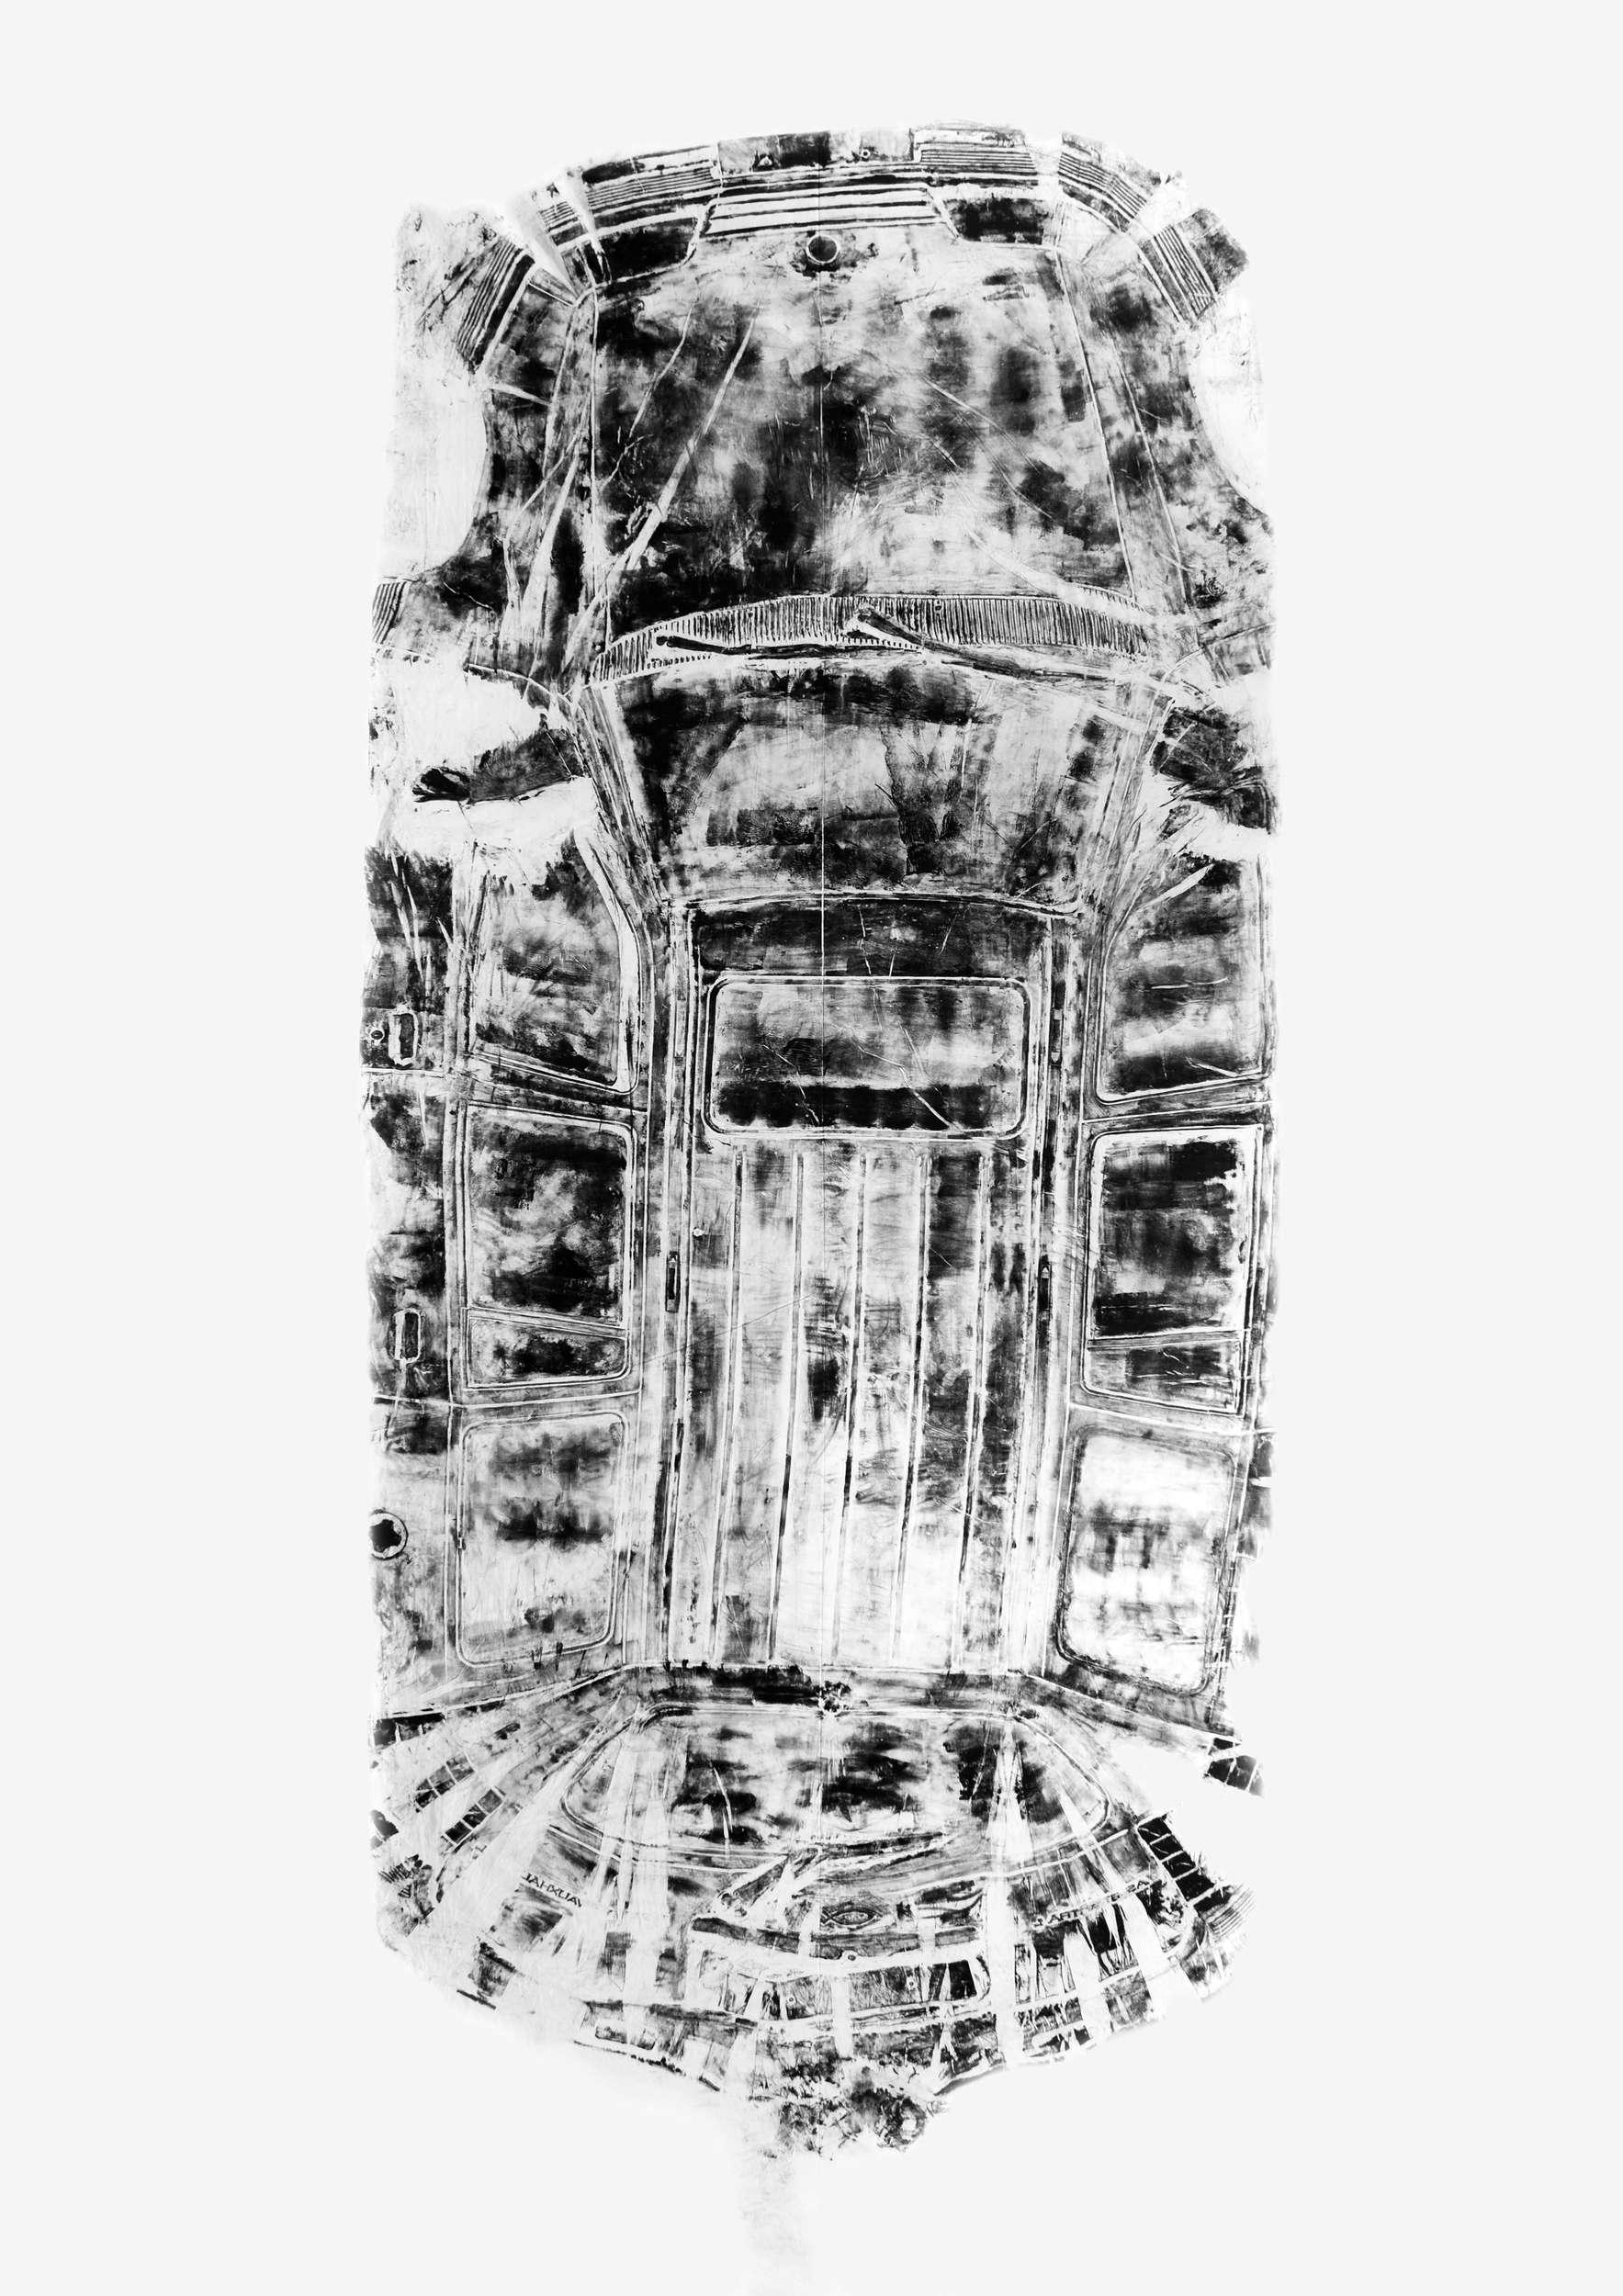 CAR InkB Image